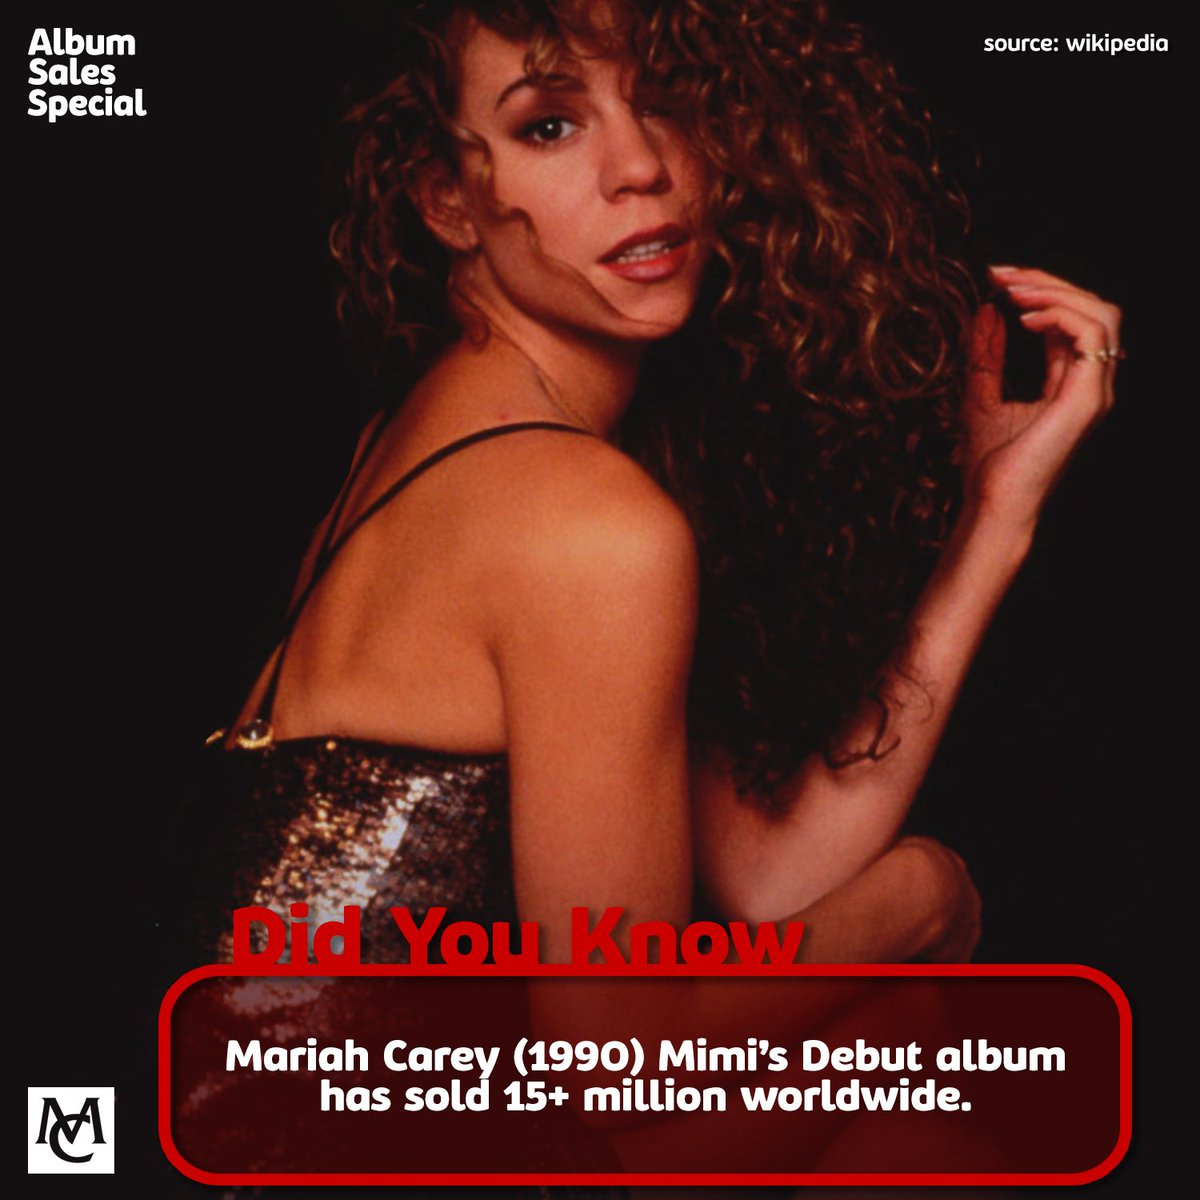 THE GREATEST!   @MariahCarey  #MariahCarey #Lambs #Lambily #Caution #CautionWorldTour #StreamCaution #StreamMariah<br>http://pic.twitter.com/FjdzgXTqWS